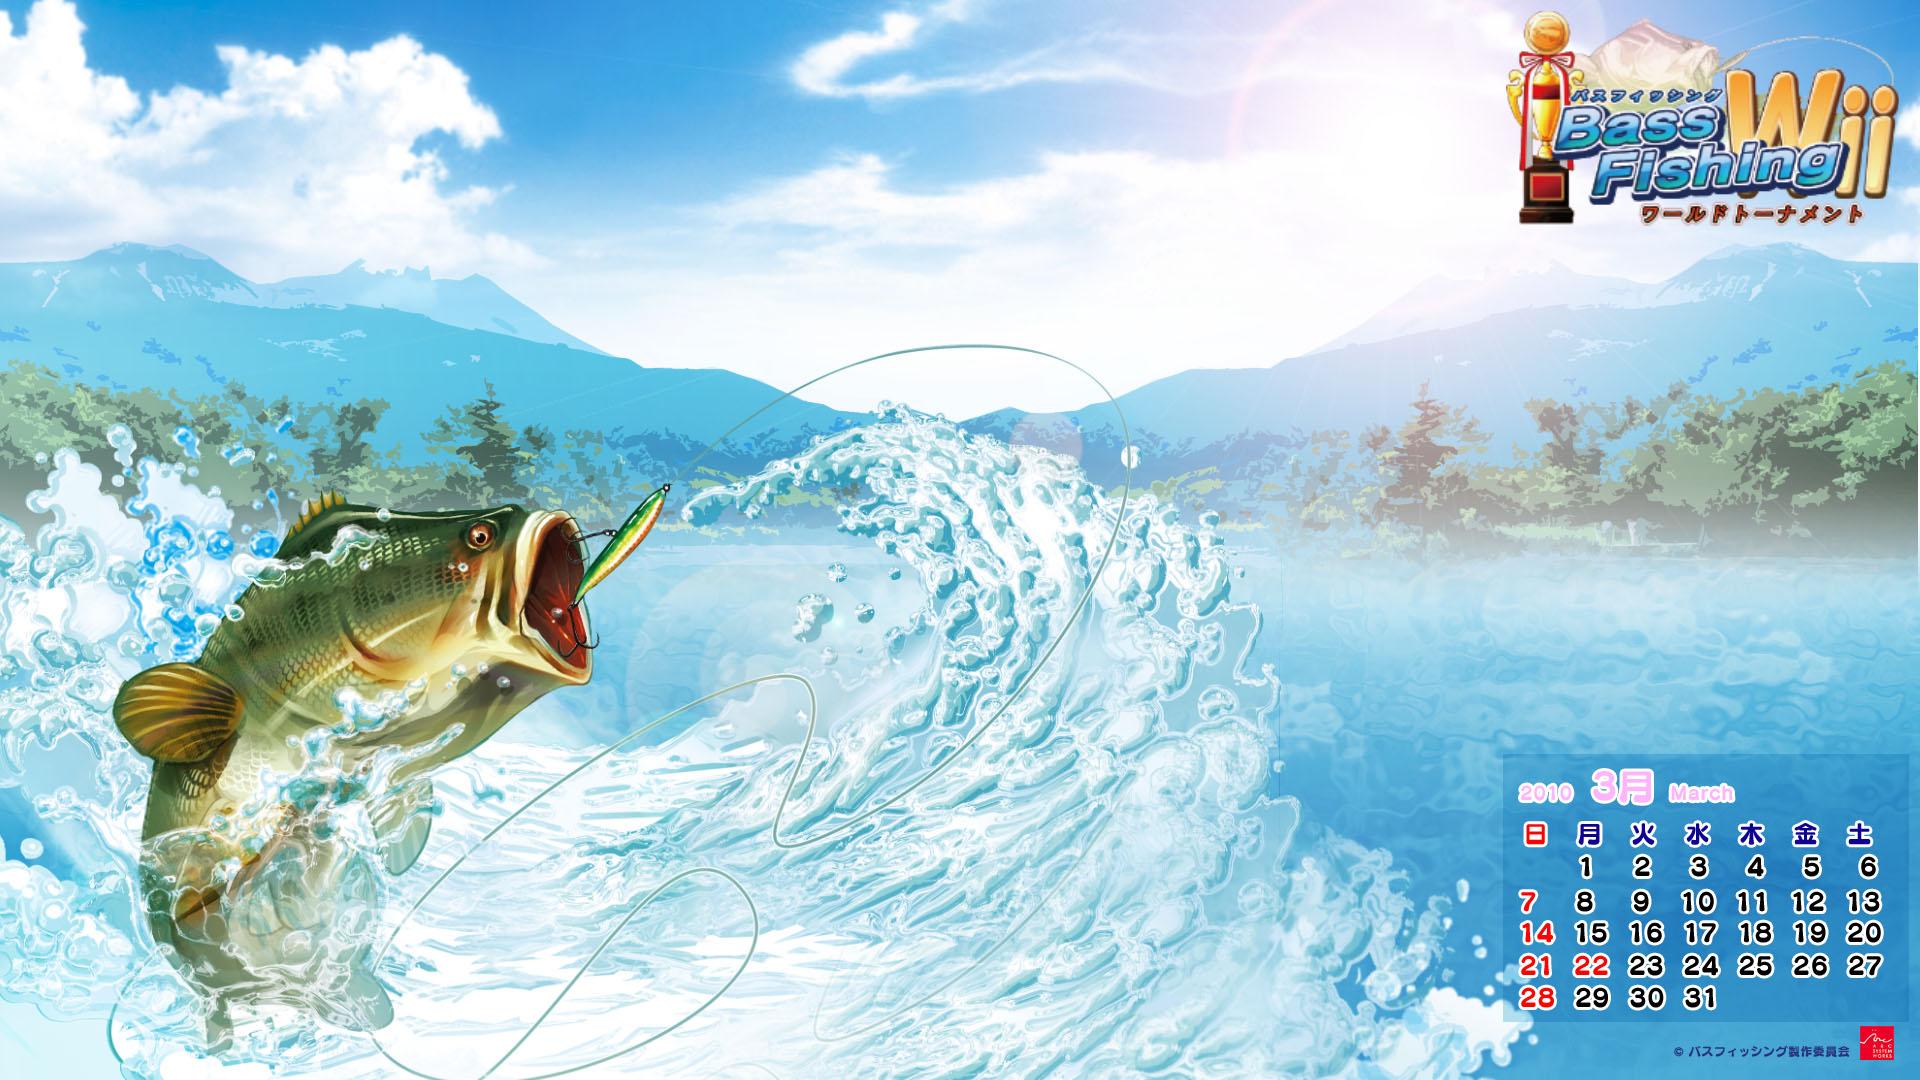 Detail Lesson Walla Fishing wallpapers HD   139212 1920x1080